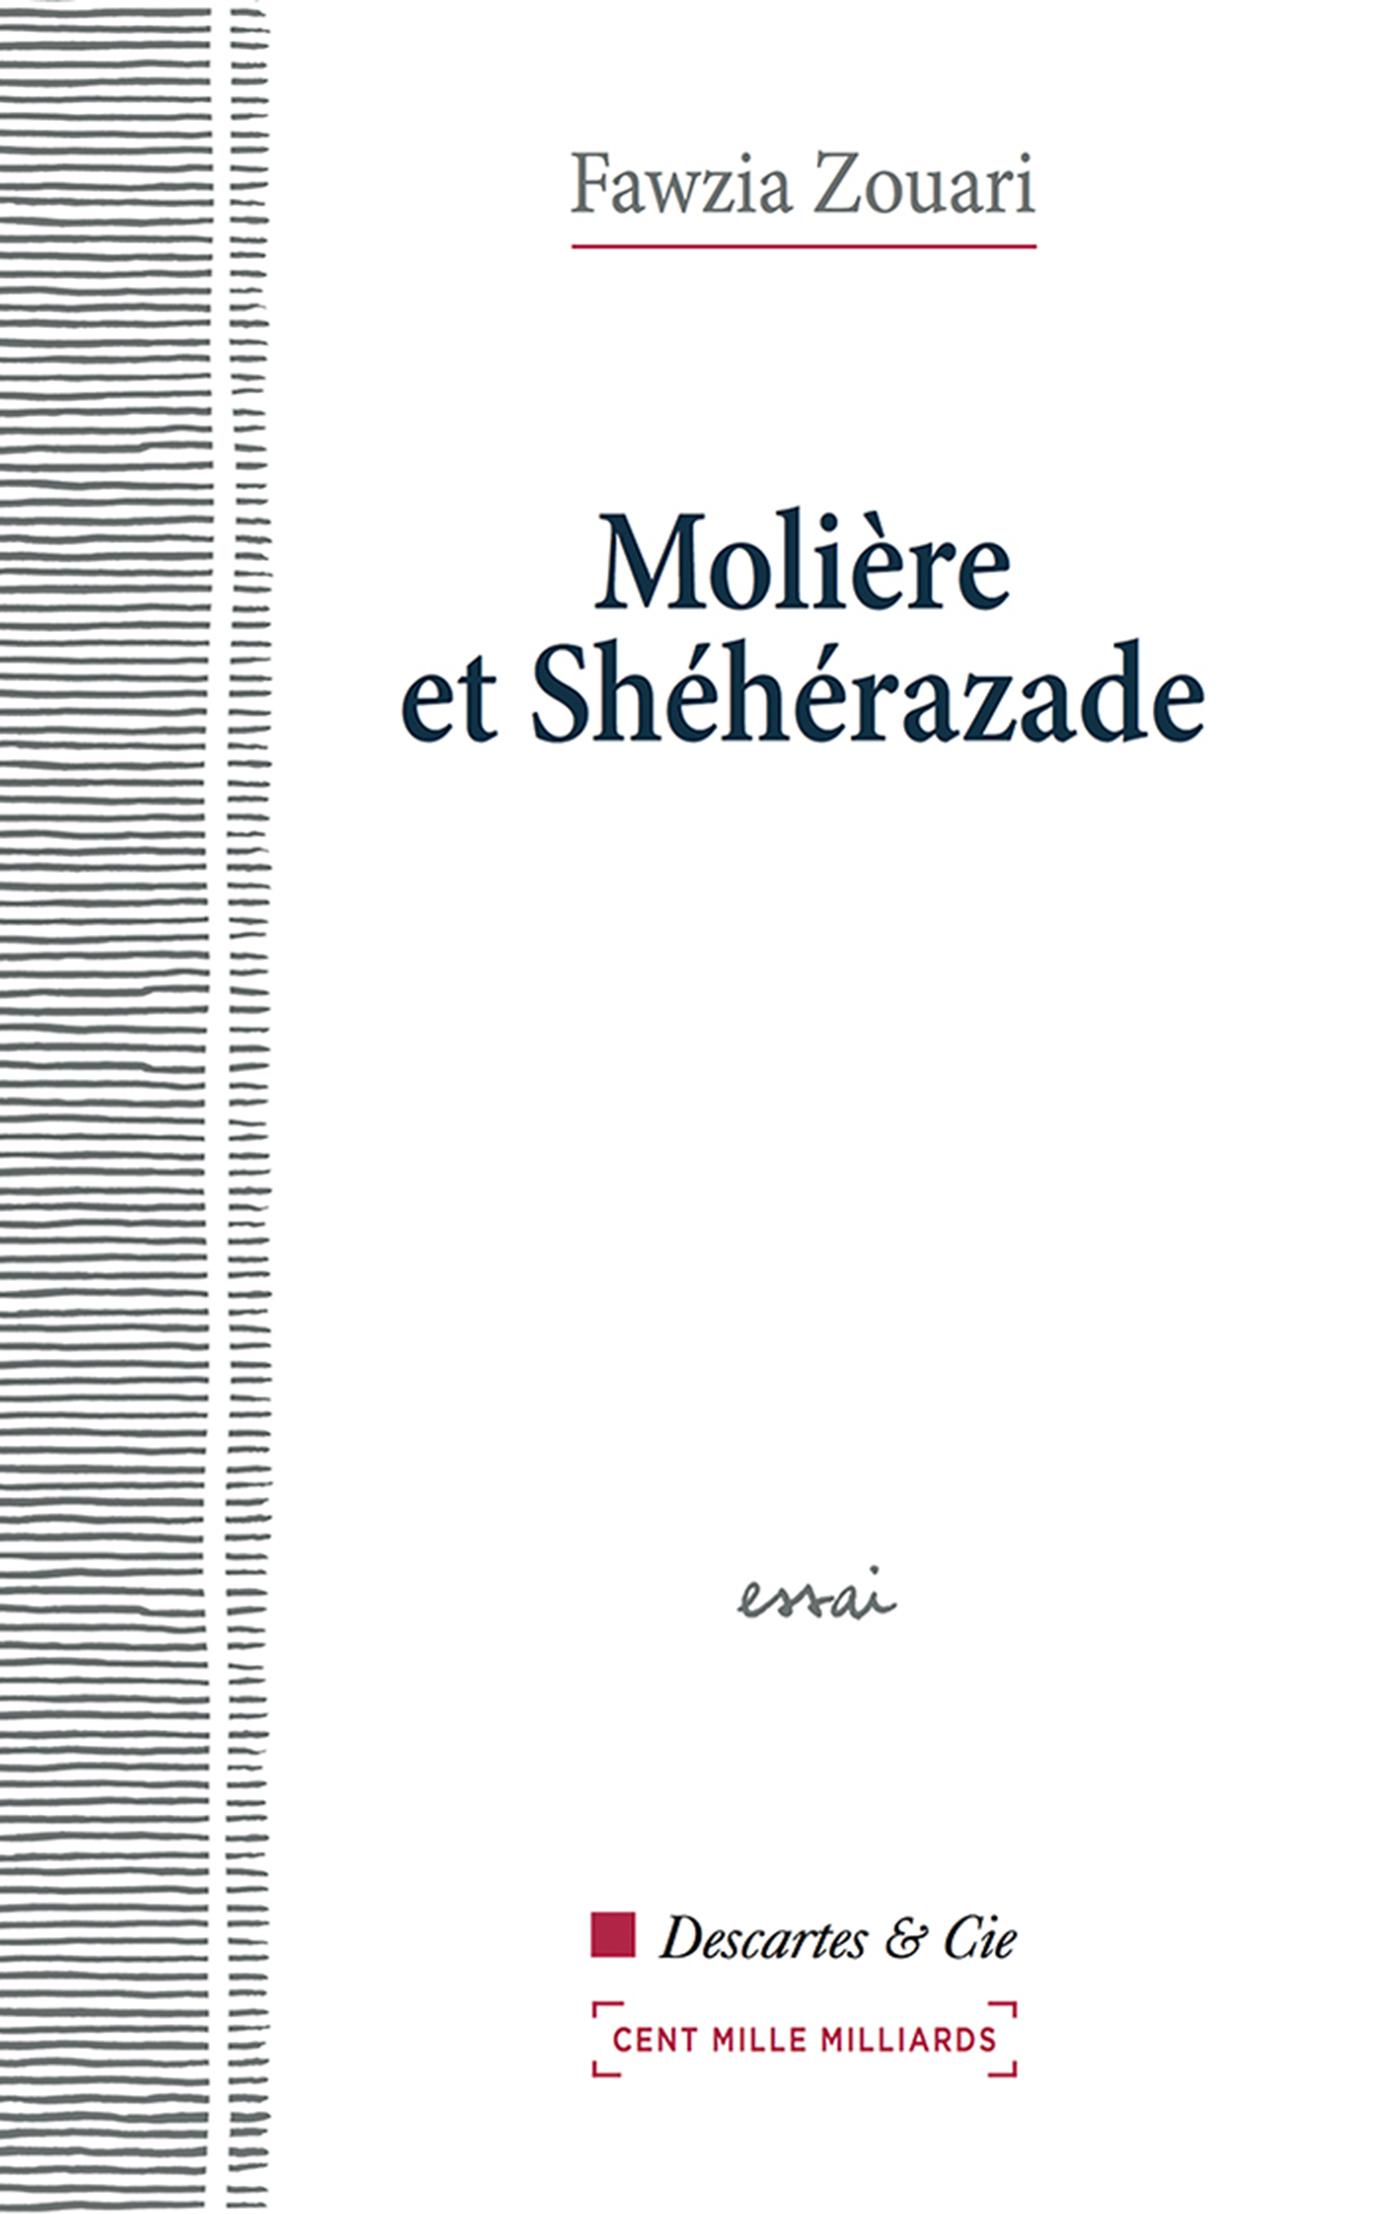 MOLIERE ET SHEHERAZADE